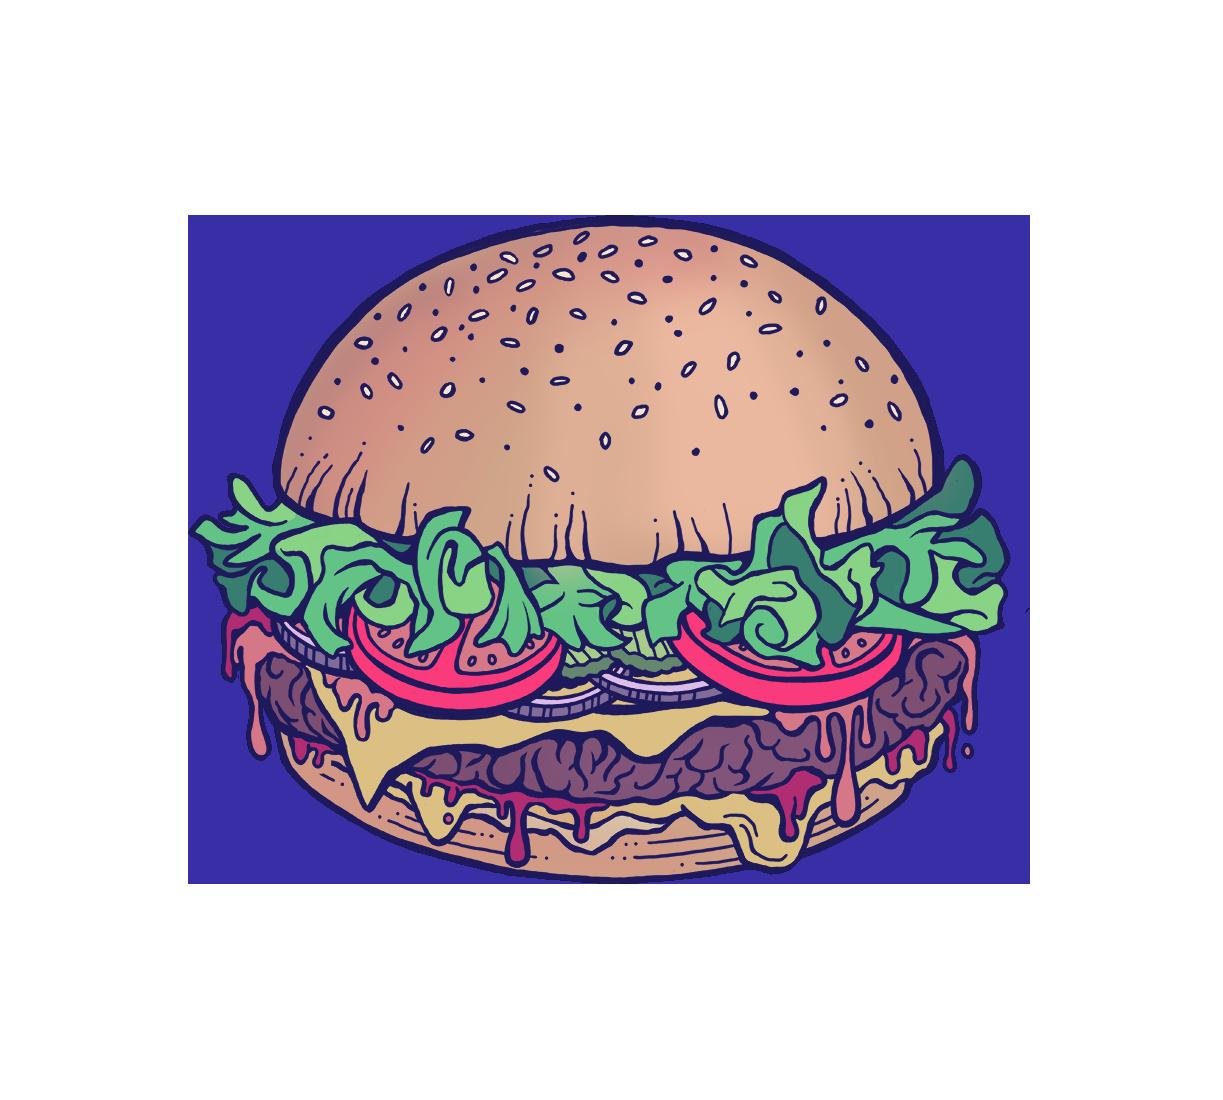 Hamburger Cheeseburger with Everything Cartoon Illustration Logo Graphic by Jessica Laine Morris